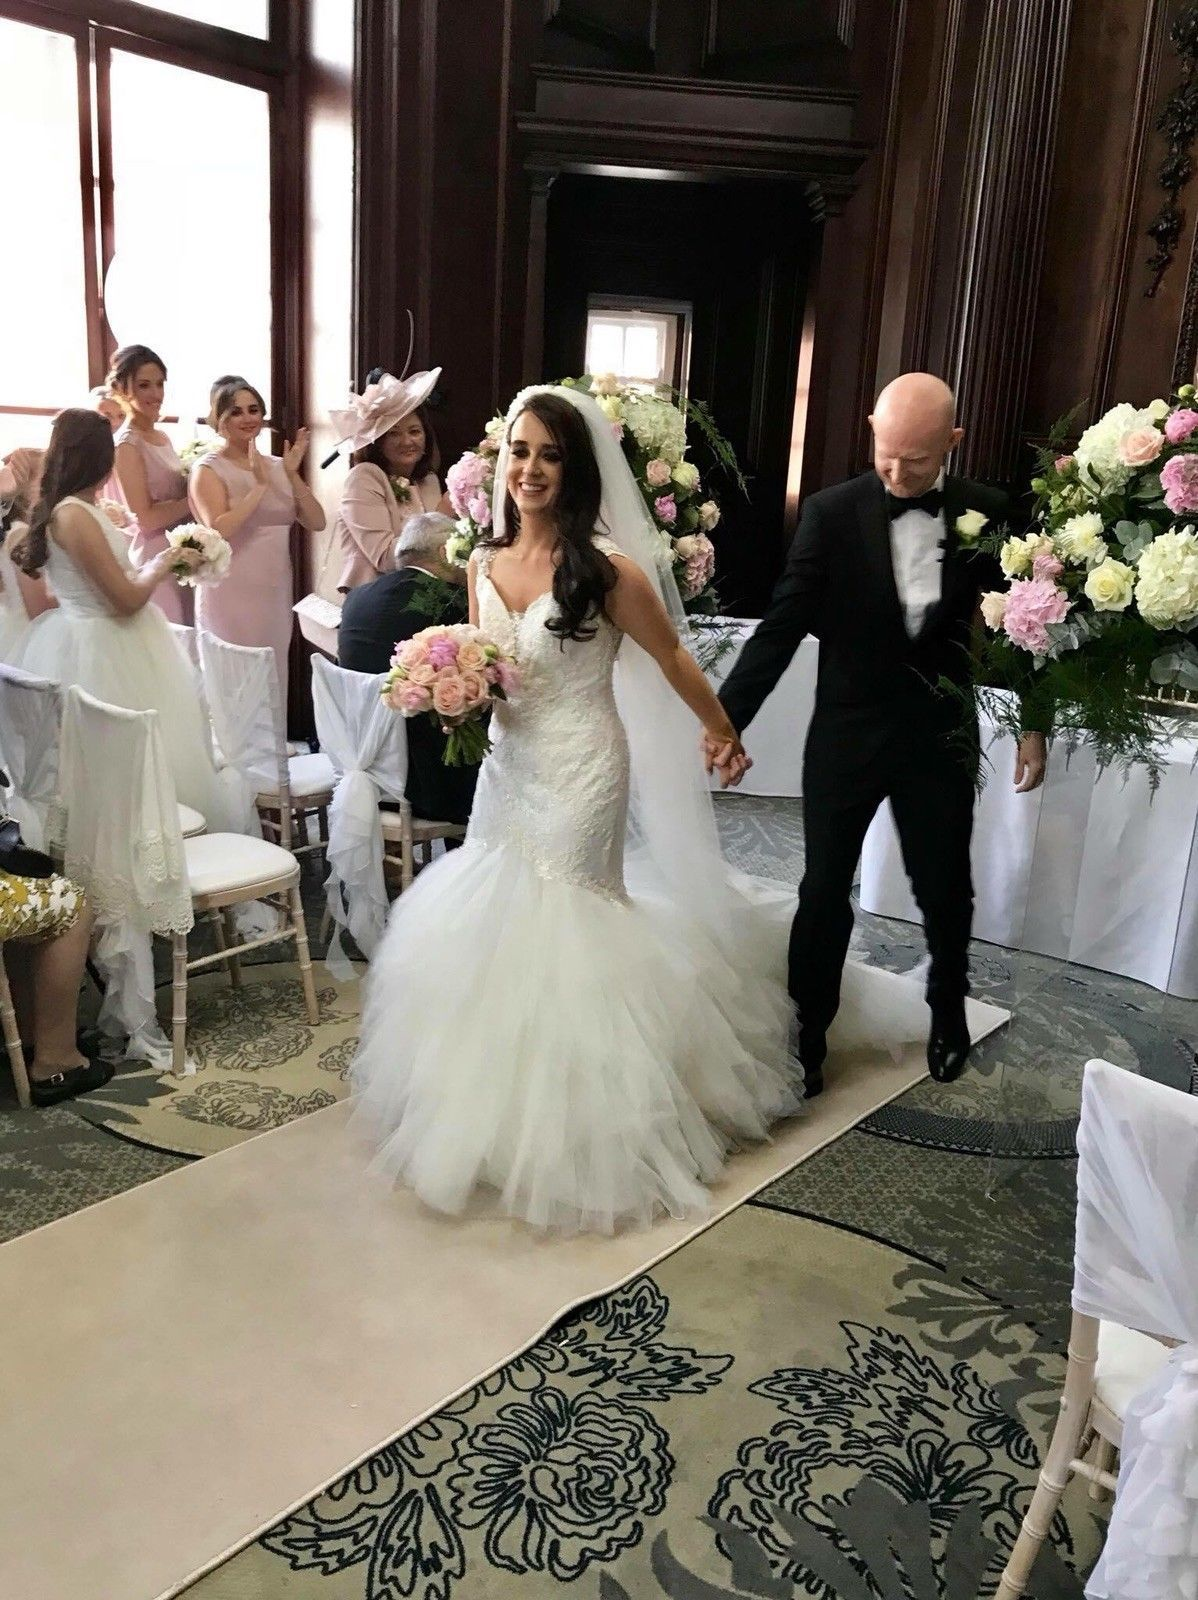 Size 8 wedding dress  Justin Alexander Wedding Dress  Size   eBay  wedding